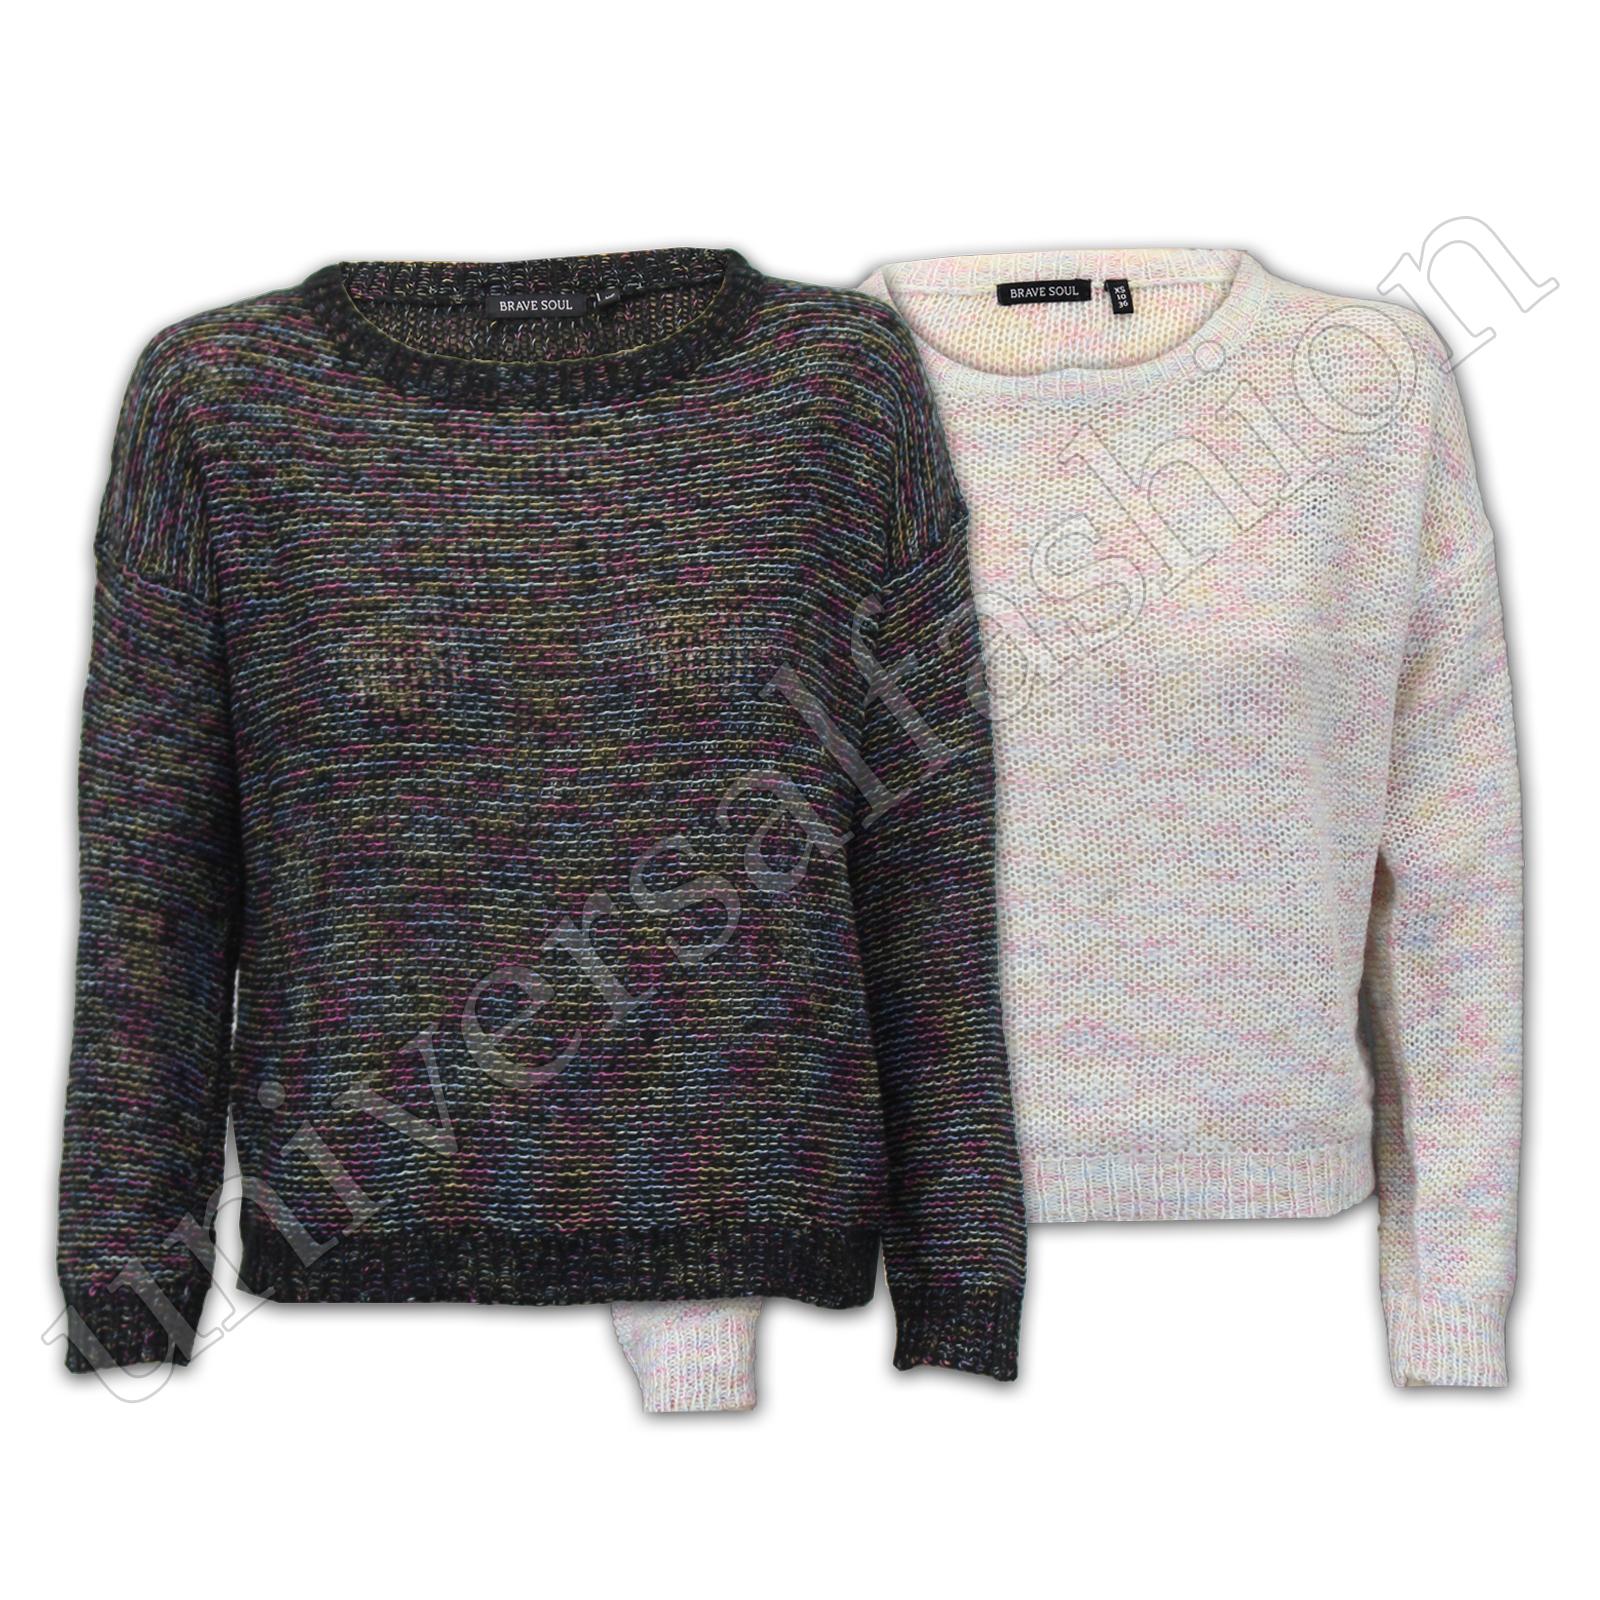 Jumper-Ladies-Alma-valiente-para-mujer-Knitted-holgados-Top-Sweater-Pullover-de-punto-Partido miniatura 4